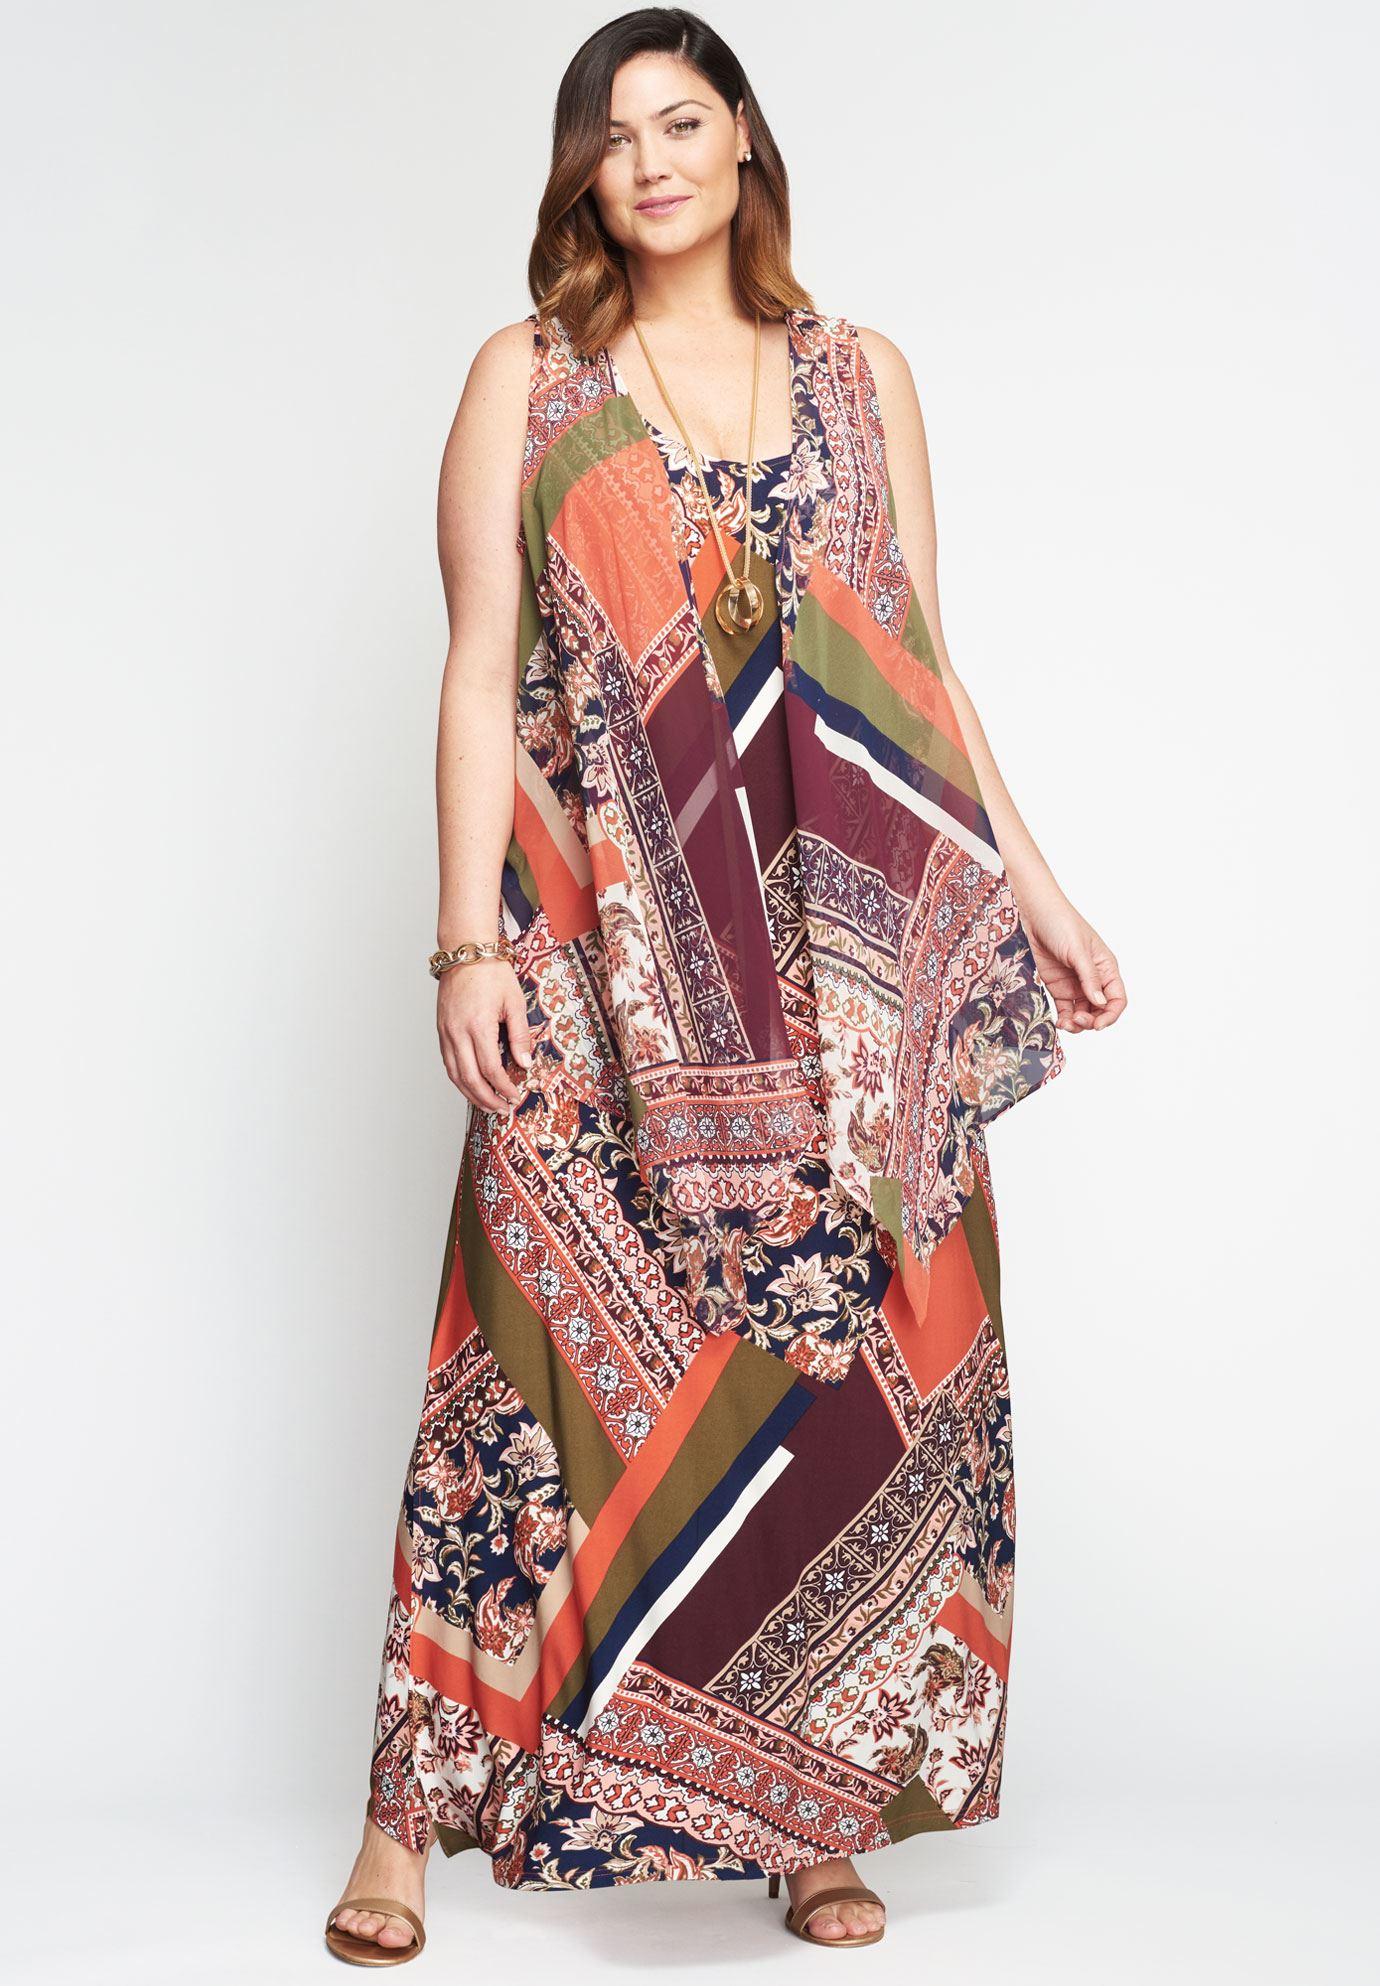 Travel Knit Maxi Dress Vest Set Plus Size Maxi Dresses Jessica